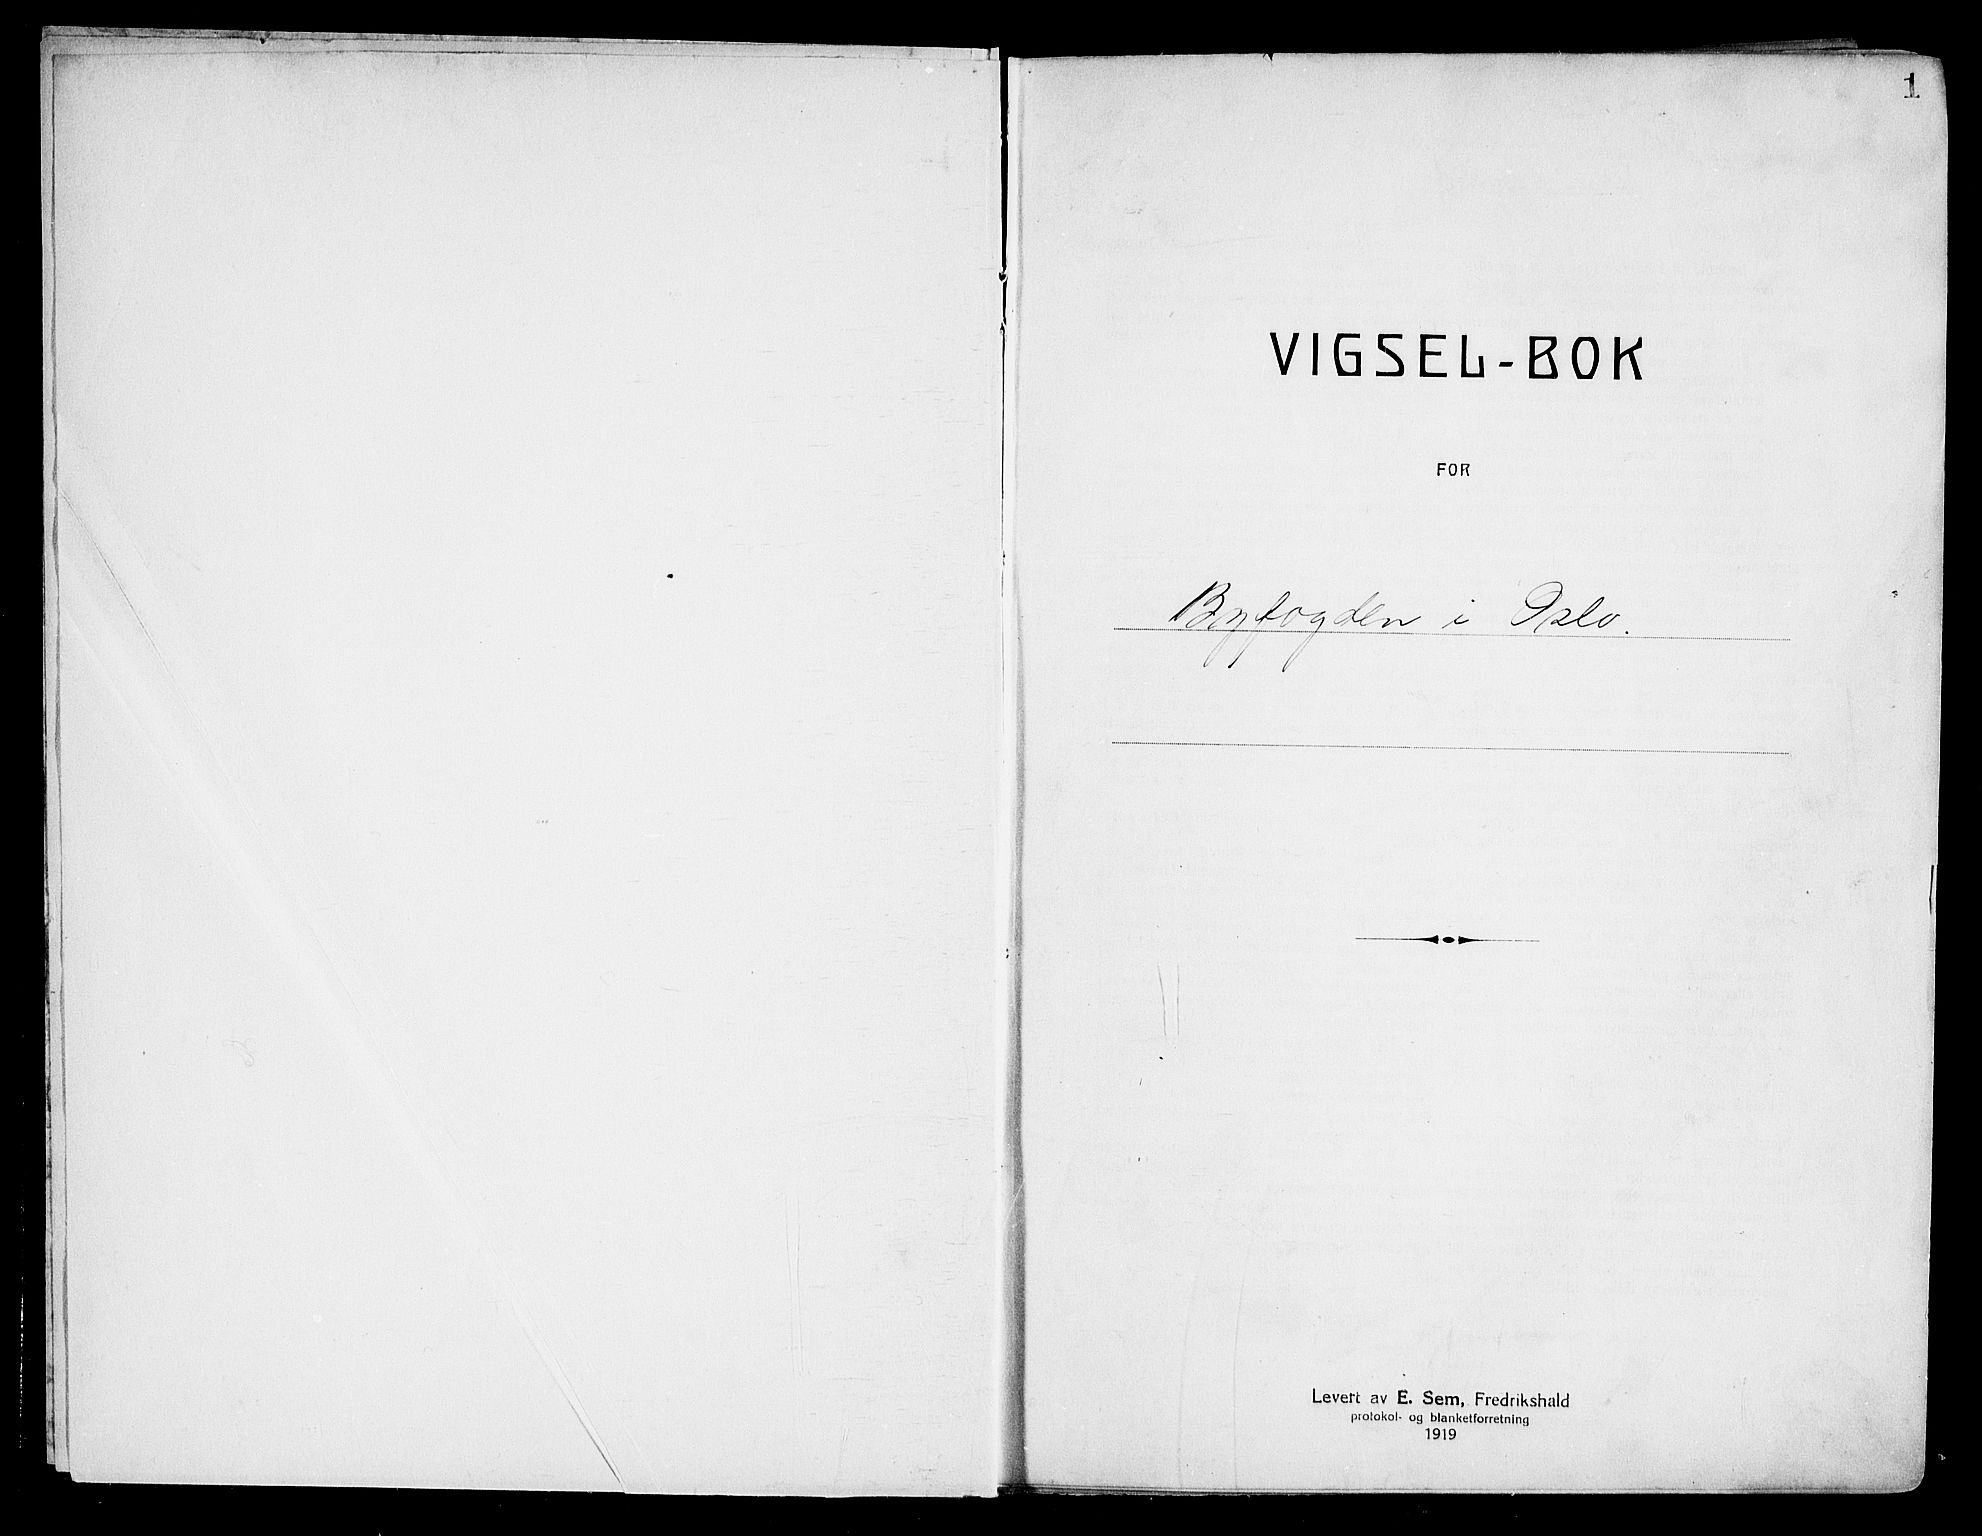 SAO, Oslo byfogd avd. I, L/Lb/Lbb/L0027: Notarialprotokoll, rekke II: Vigsler, 1936-1937, s. 1a